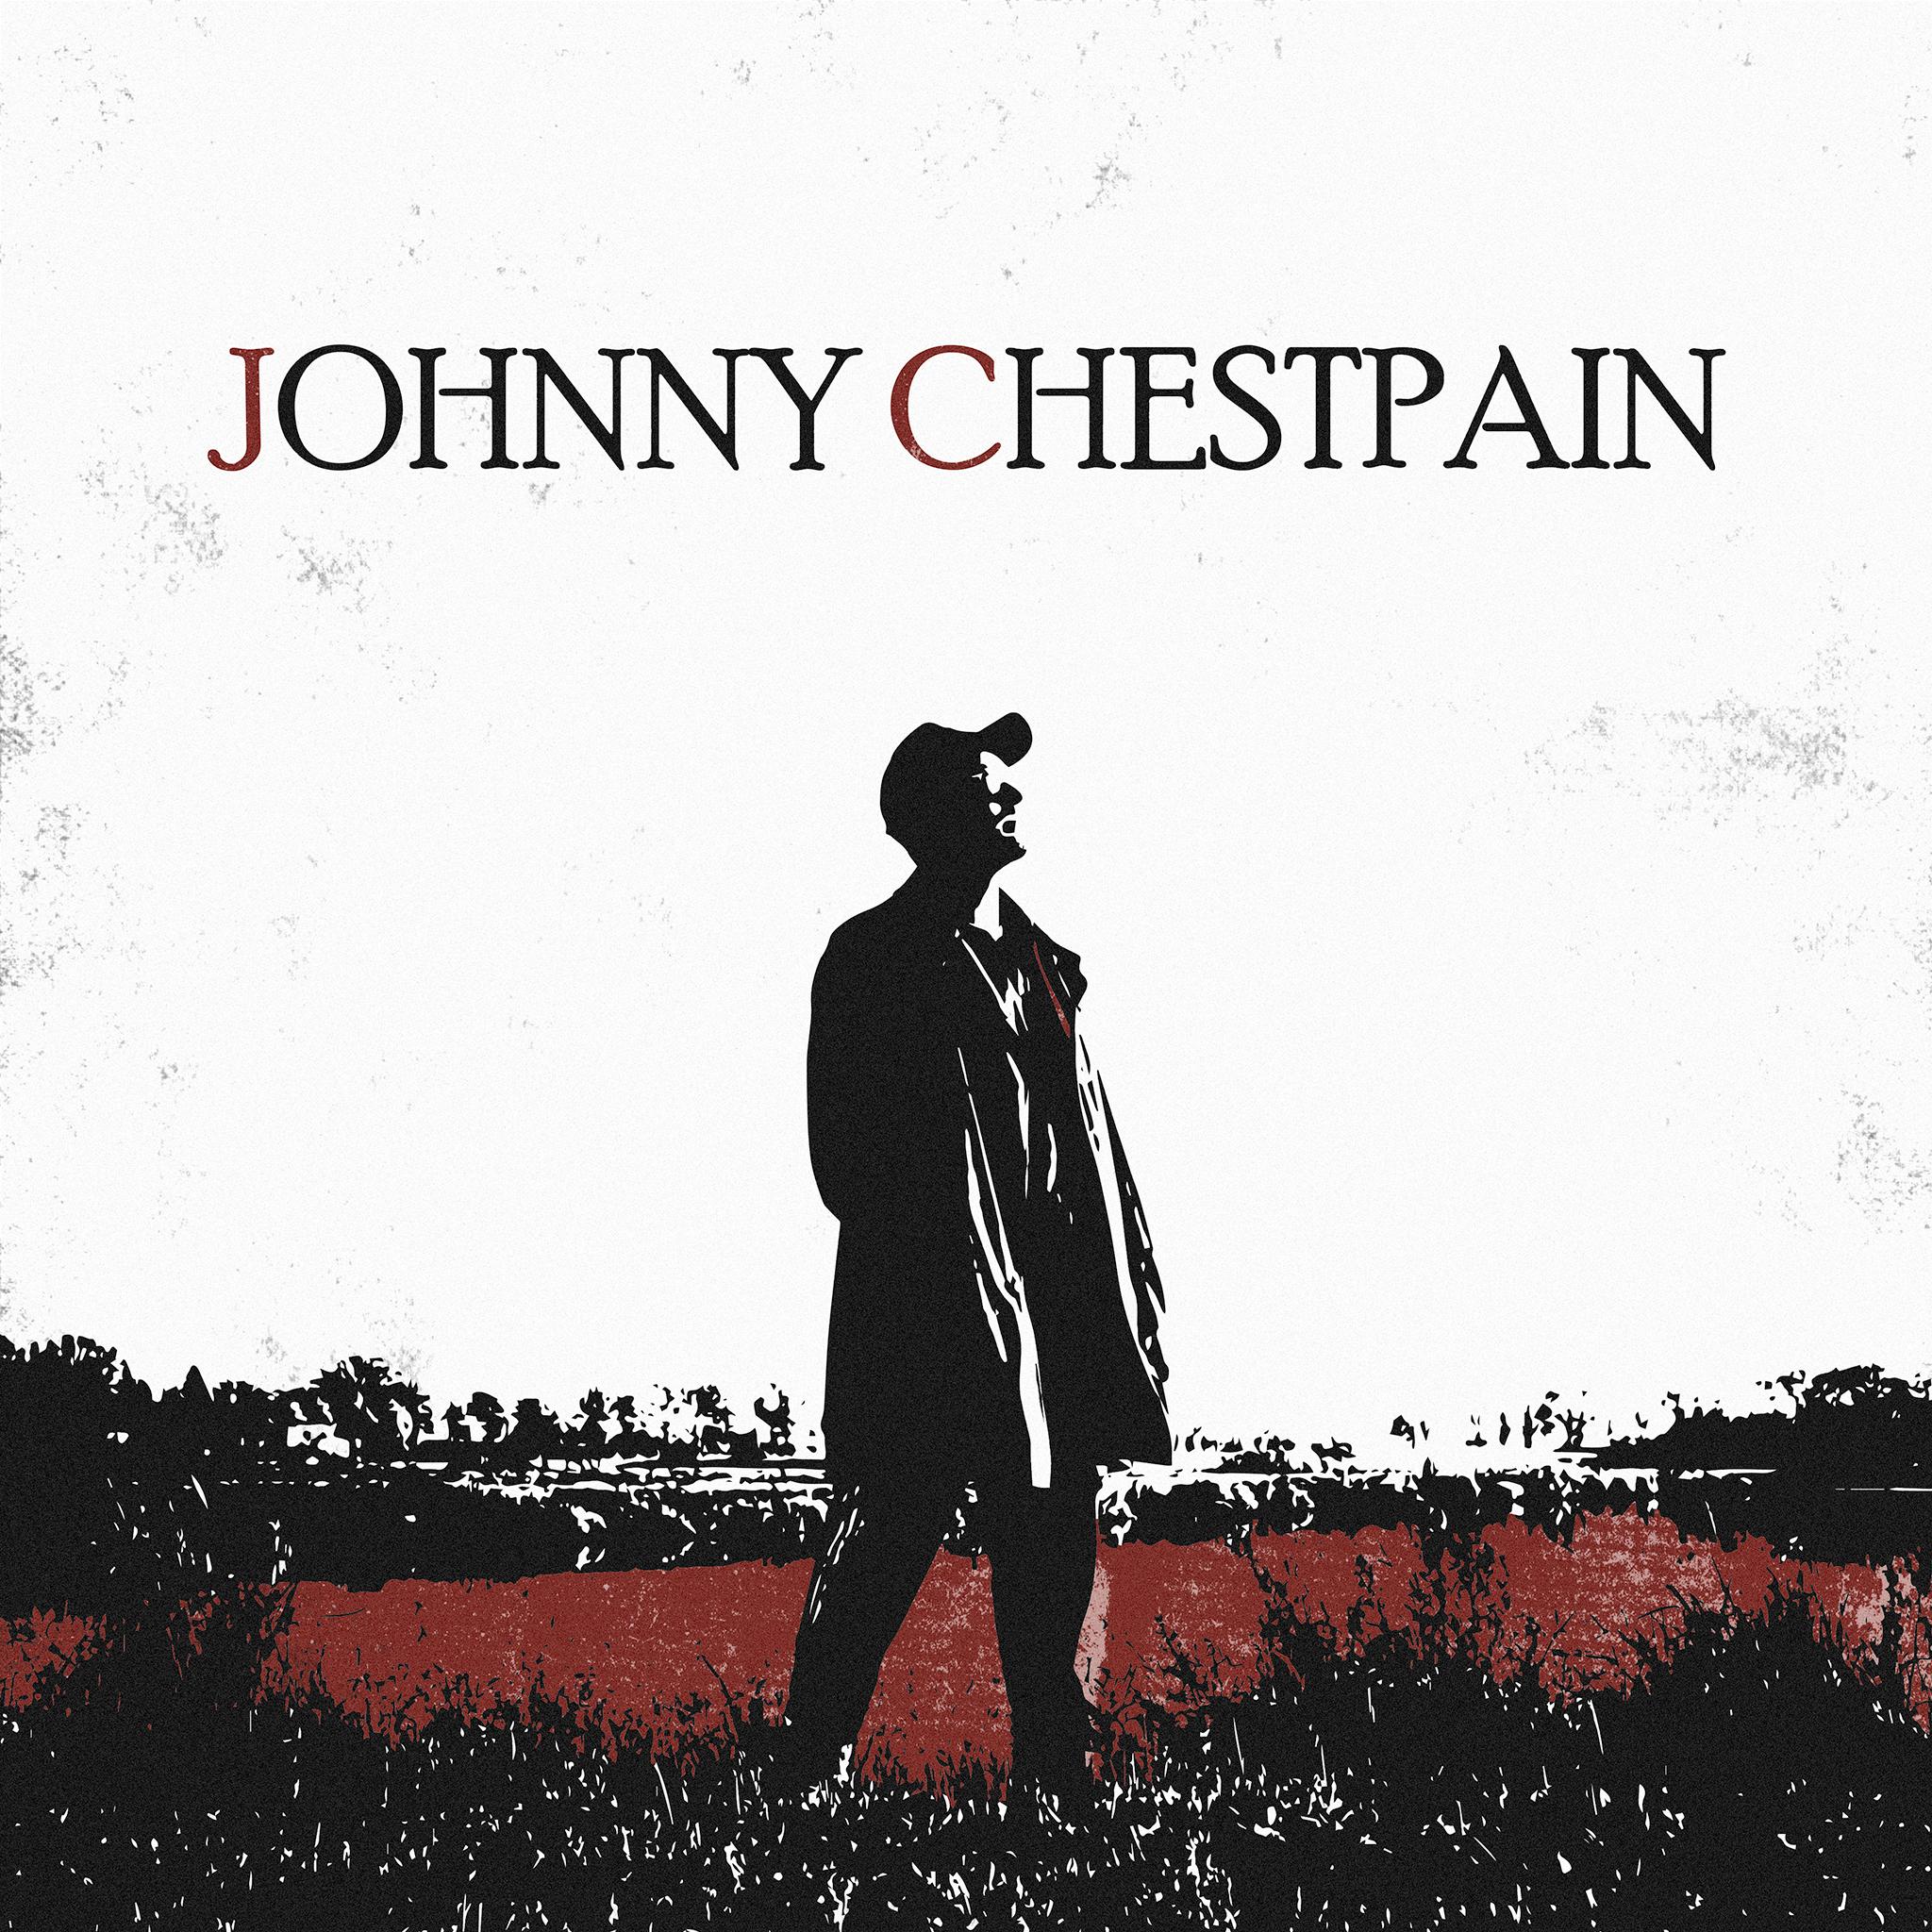 Johnny Chestpain